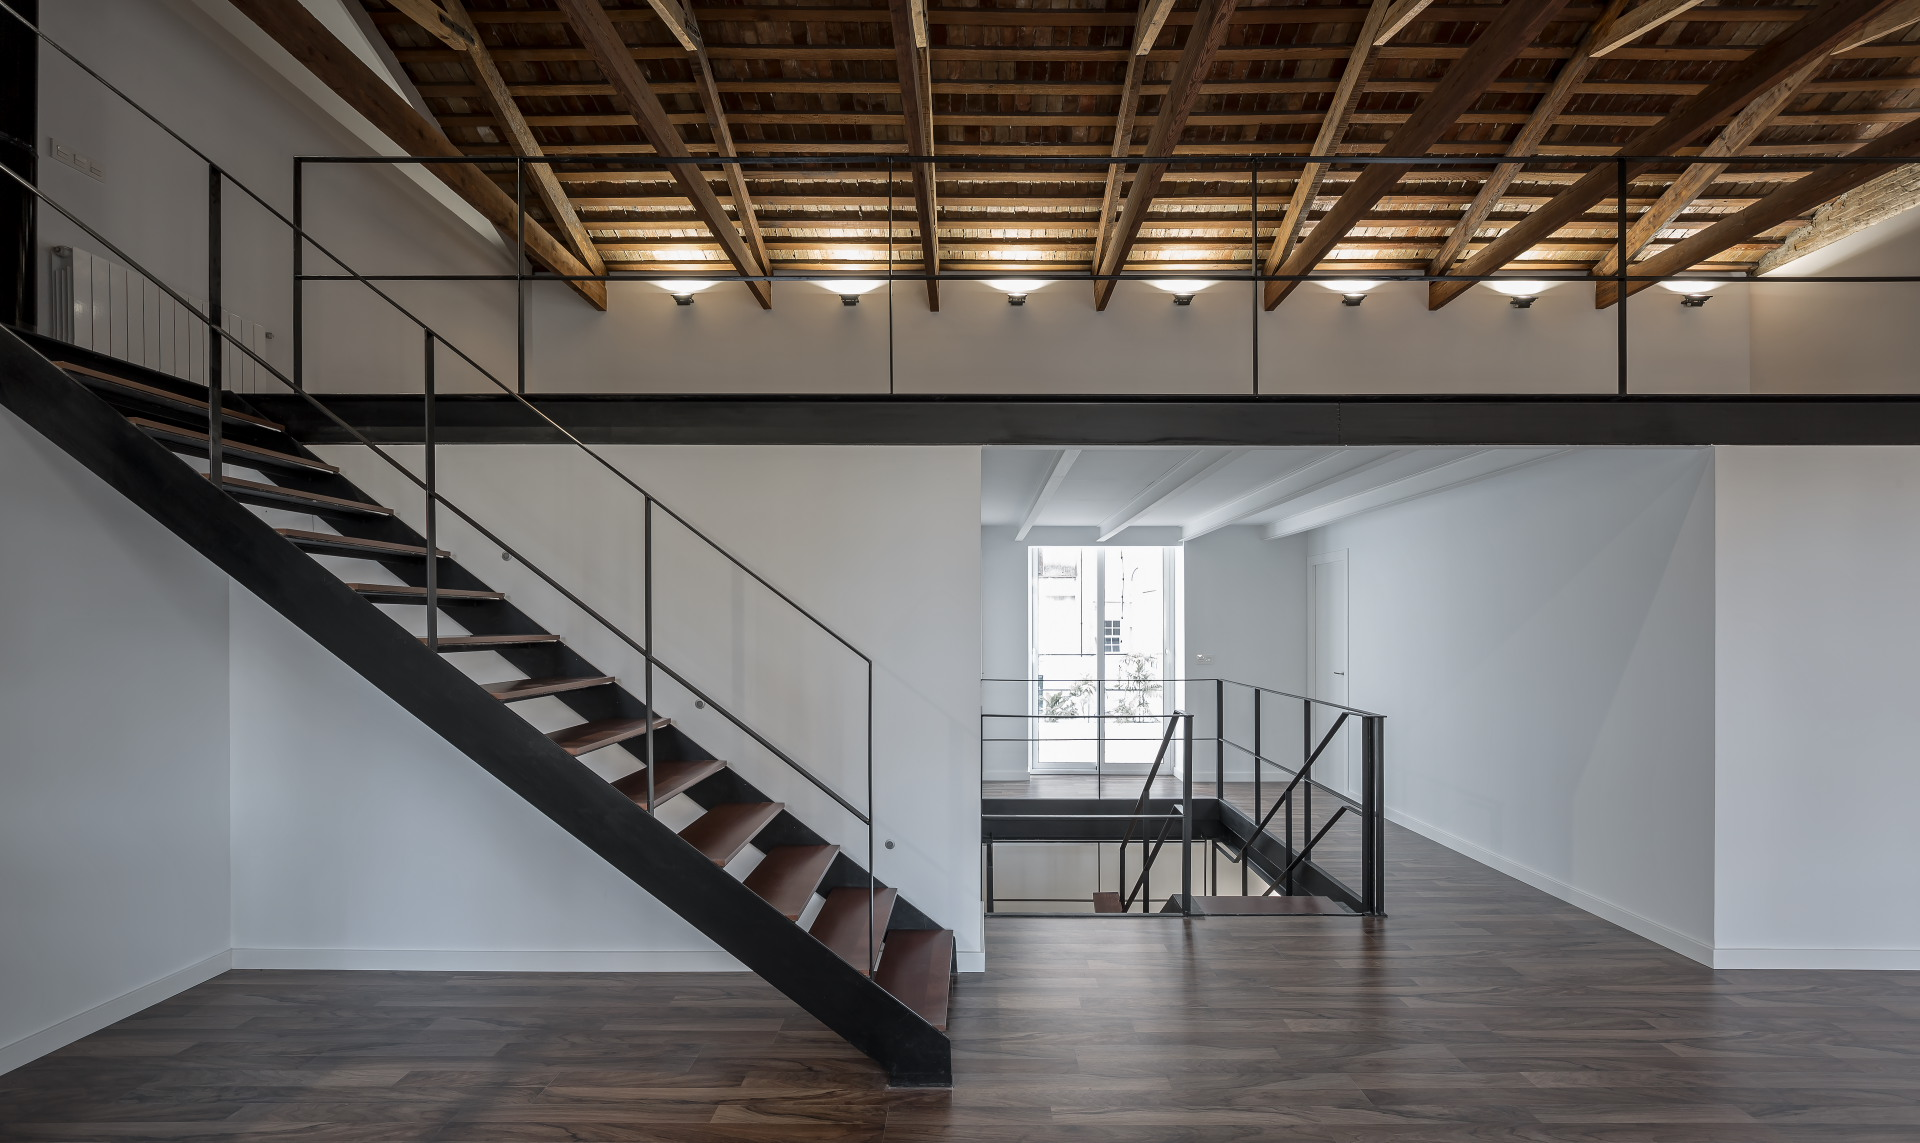 fotografia-arquitectura-valencia-german-cabo-viraje-rehabilitacion-campanar (18)